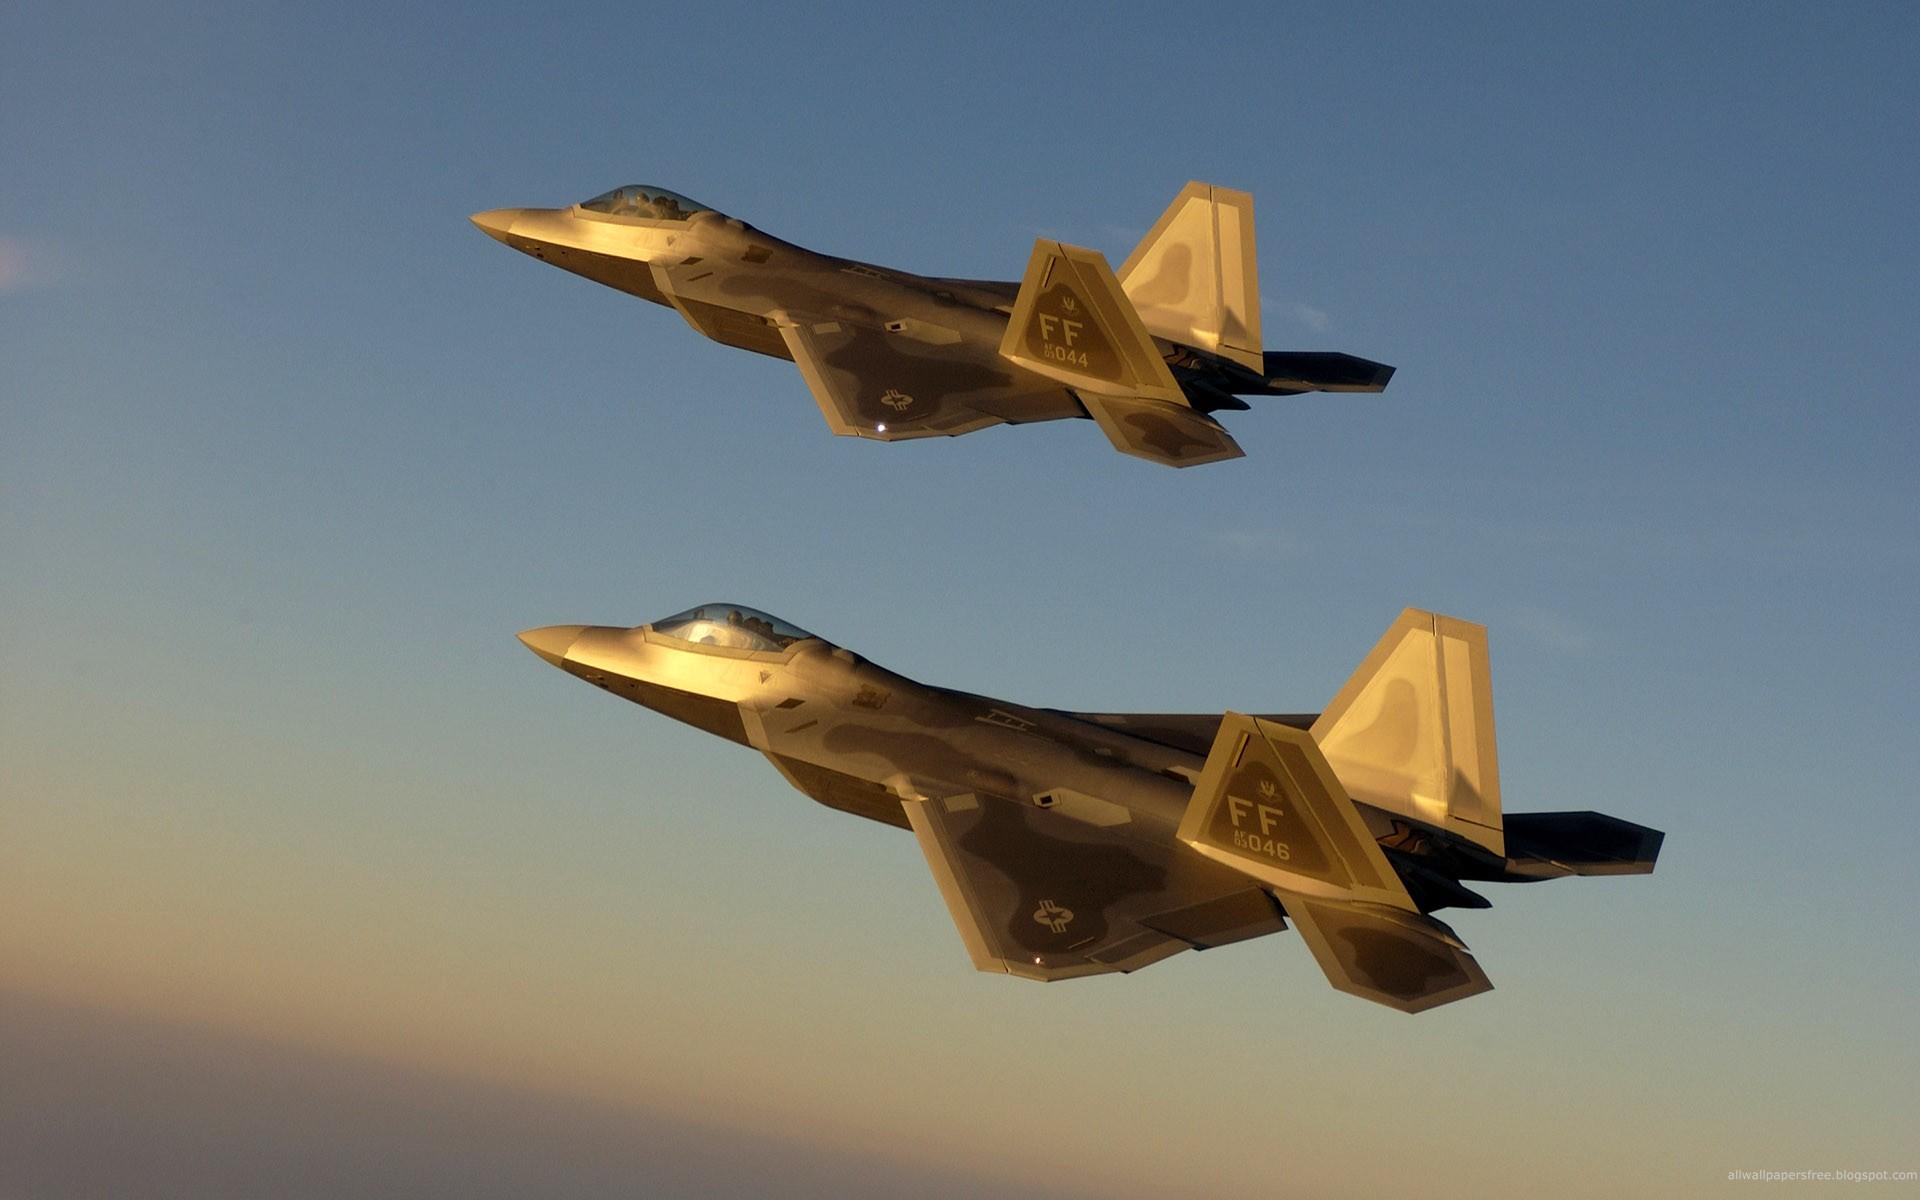 Golden Jet Fighter Planes Hd Wallpaper